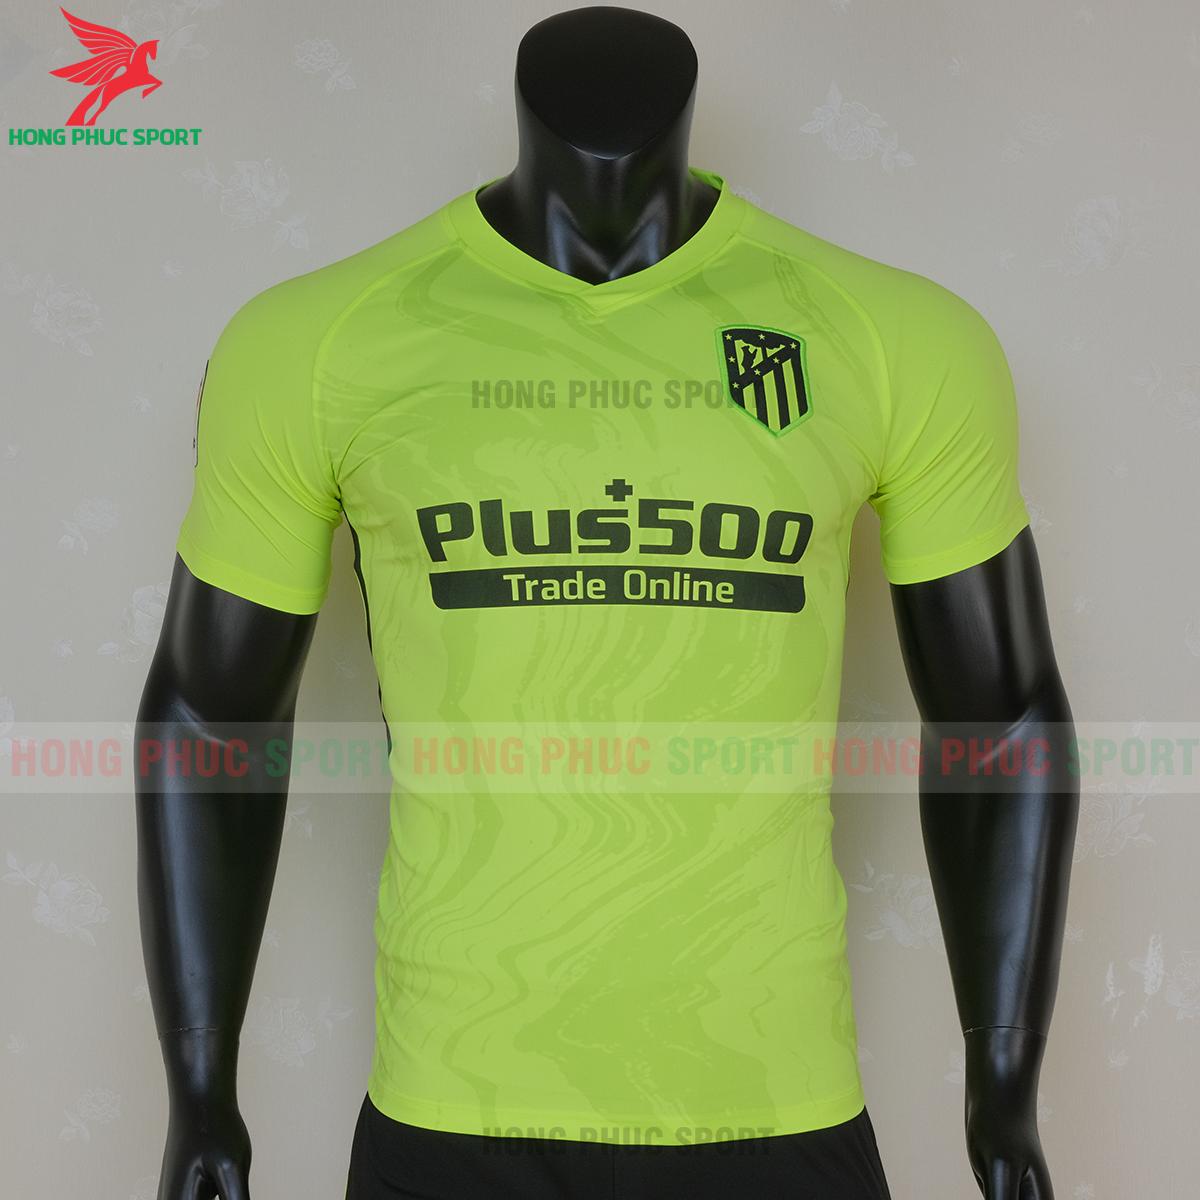 https://cdn.hongphucsport.com/unsafe/s4.shopbay.vn/files/285/ao-atletico-madrid-2020-2021-mau-thu-3-5-5f6d4aa166b97.png